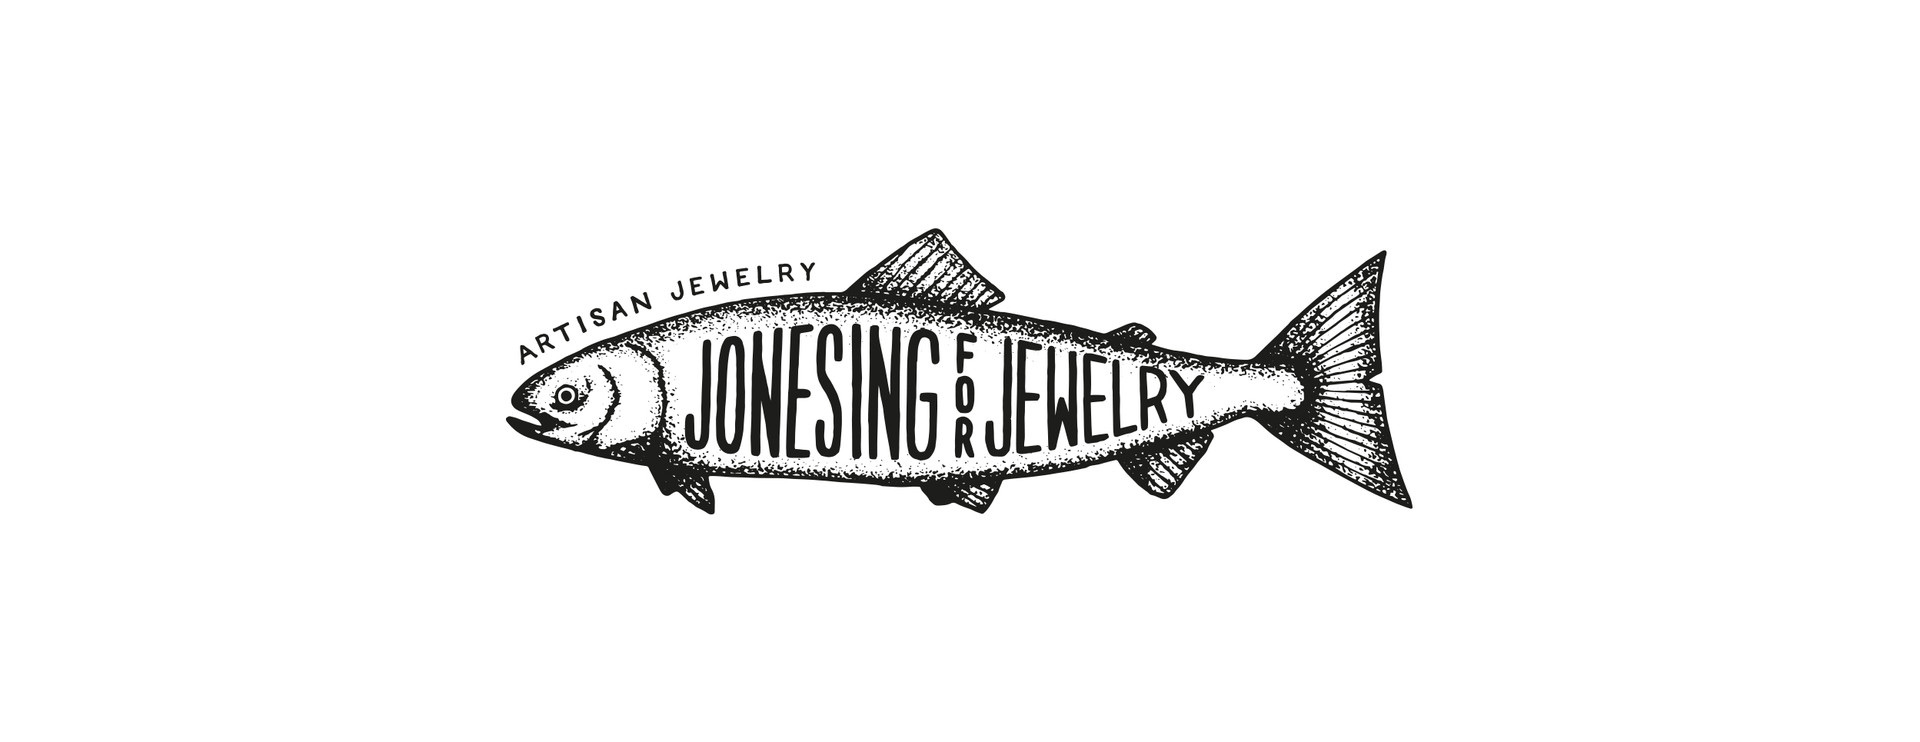 JONESING-FOR-JEWELRY_06.jpg